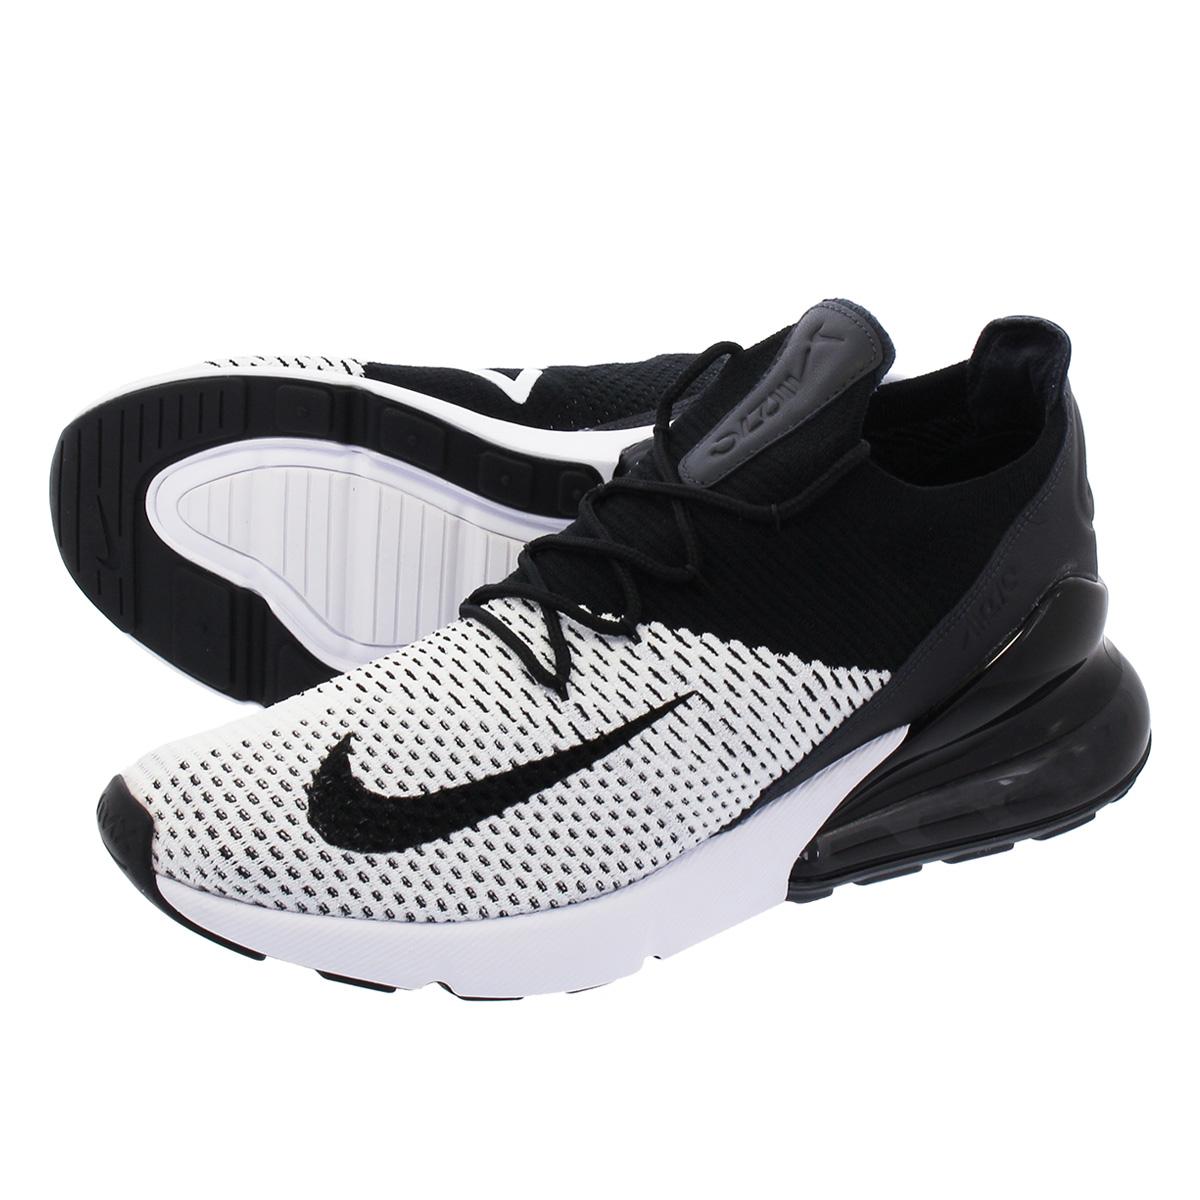 Buy Nike Air Max 270 Flyknit WhiteBlack Anthracite AO1023 100 Online